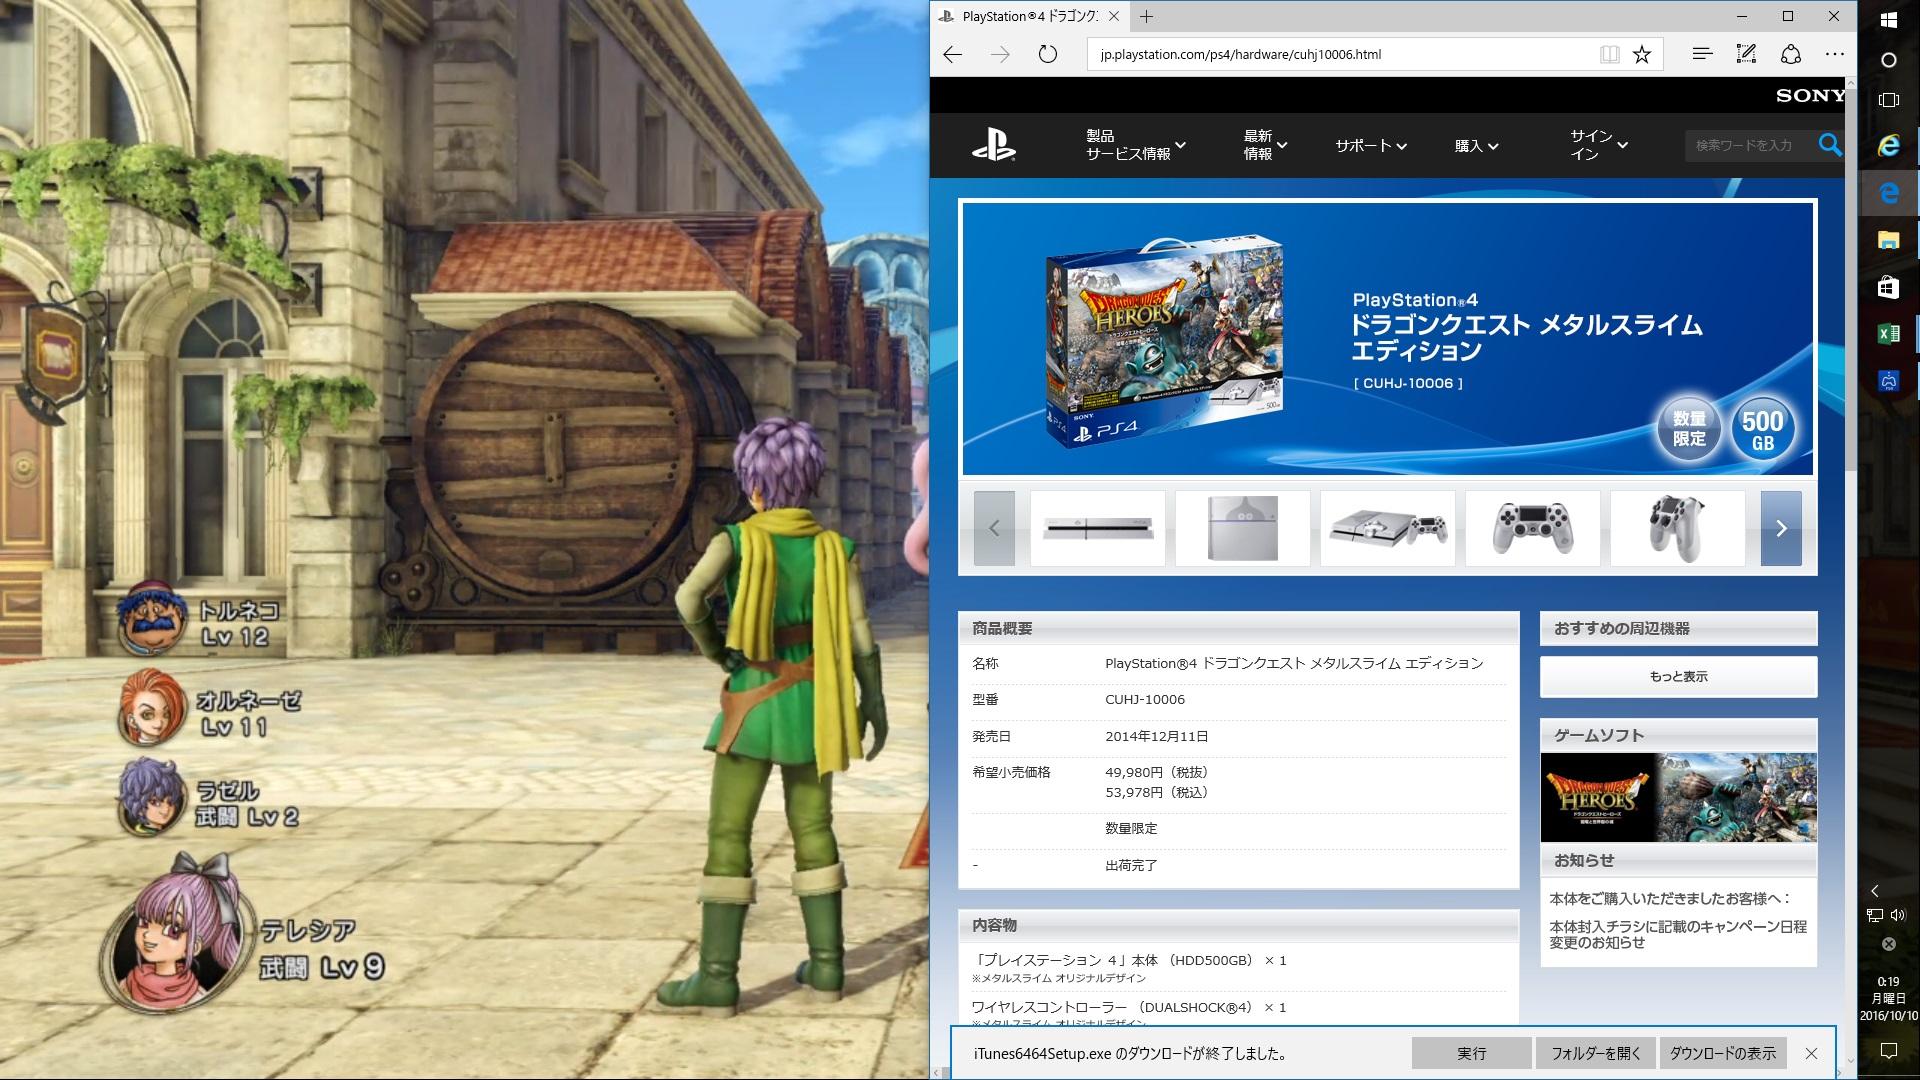 PS4リモートプレイとブラウザ一緒に起動